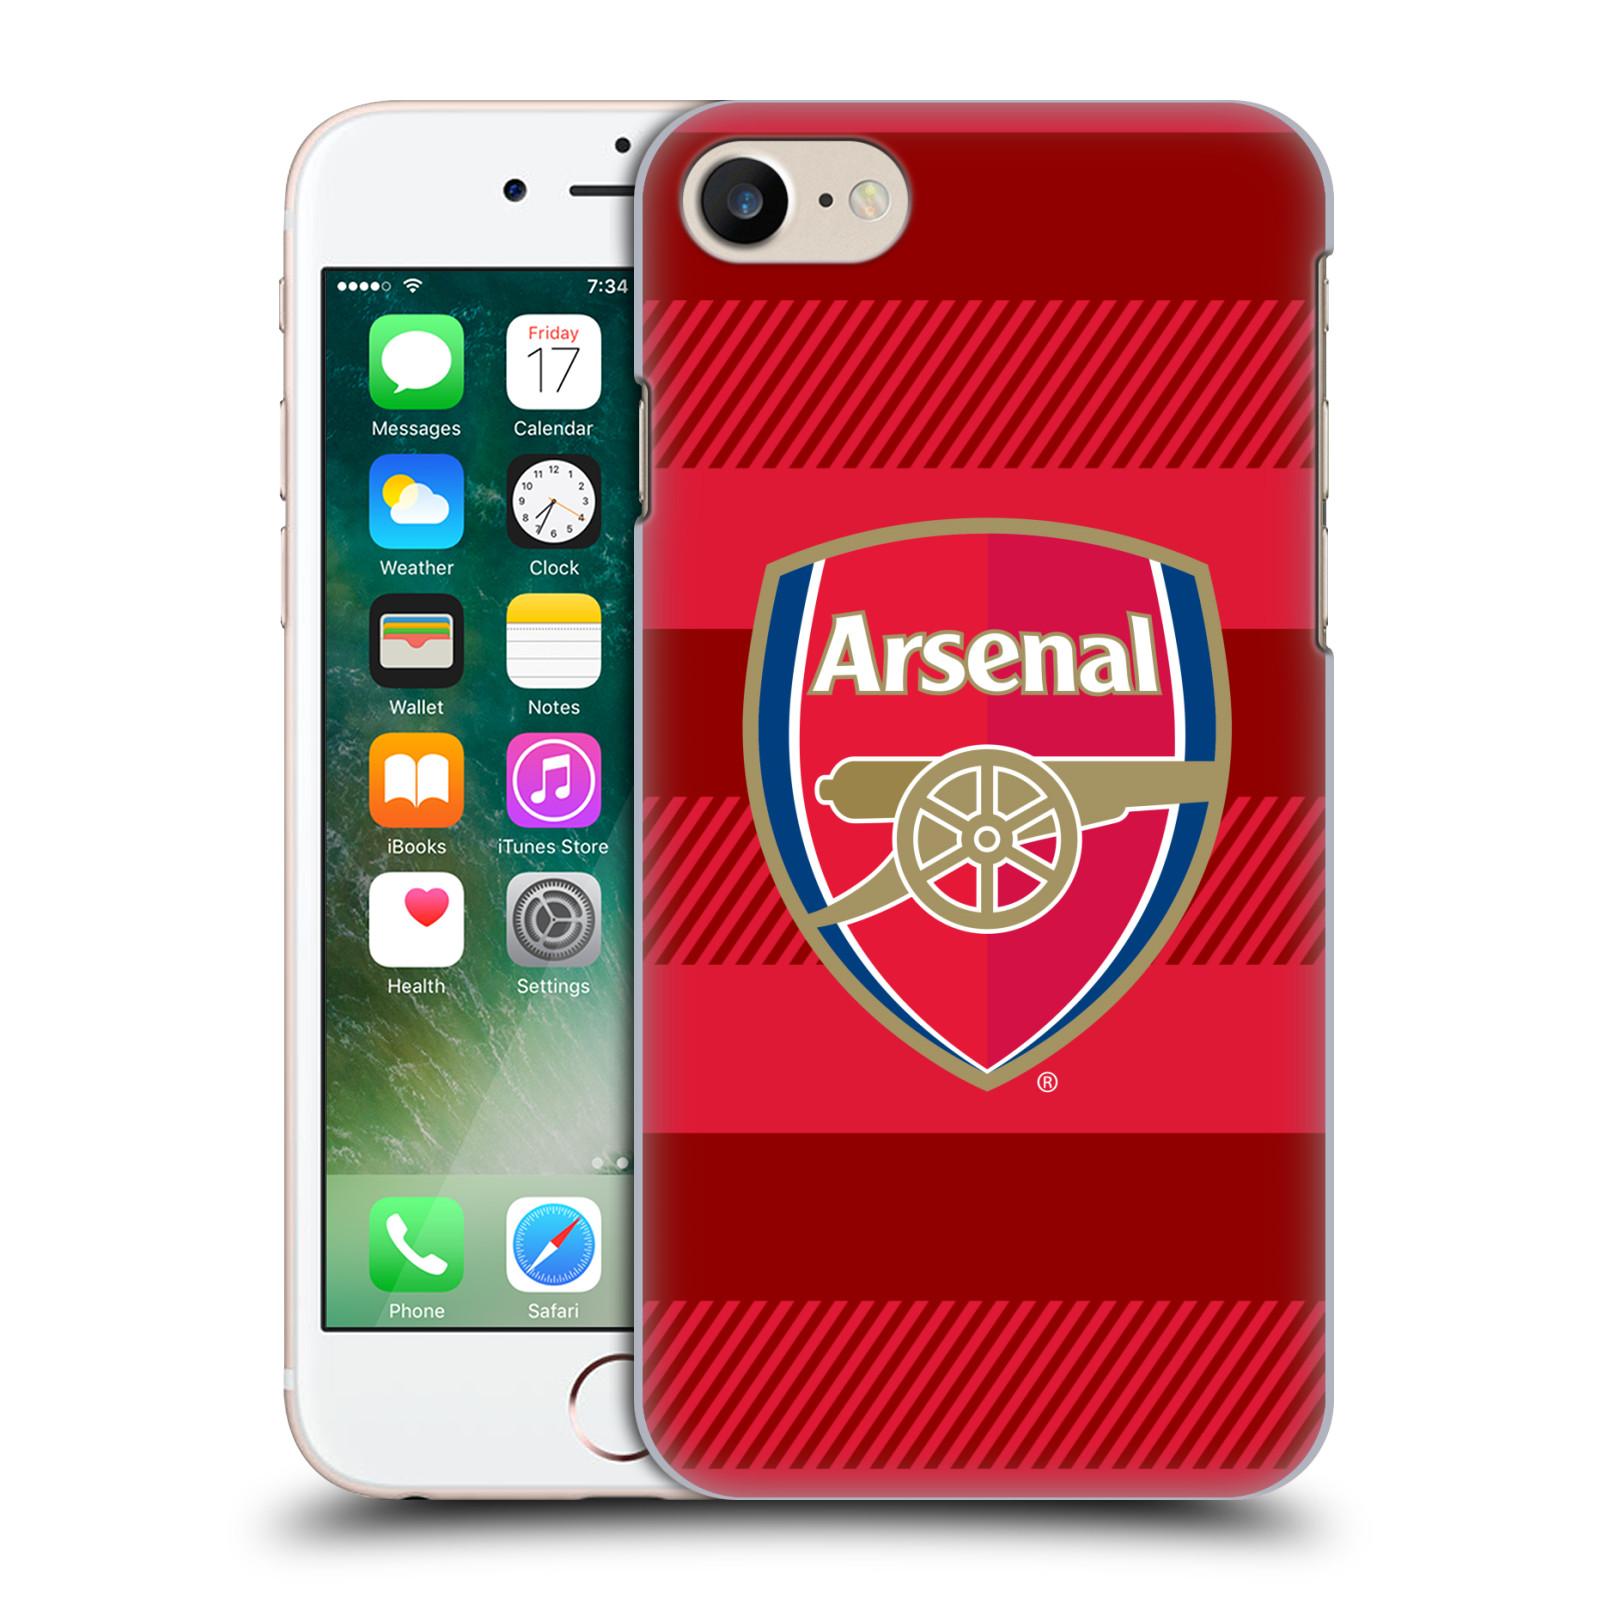 Plastové pouzdro na mobil Apple iPhone 7 - Head Case - Arsenal FC - Logo s pruhy